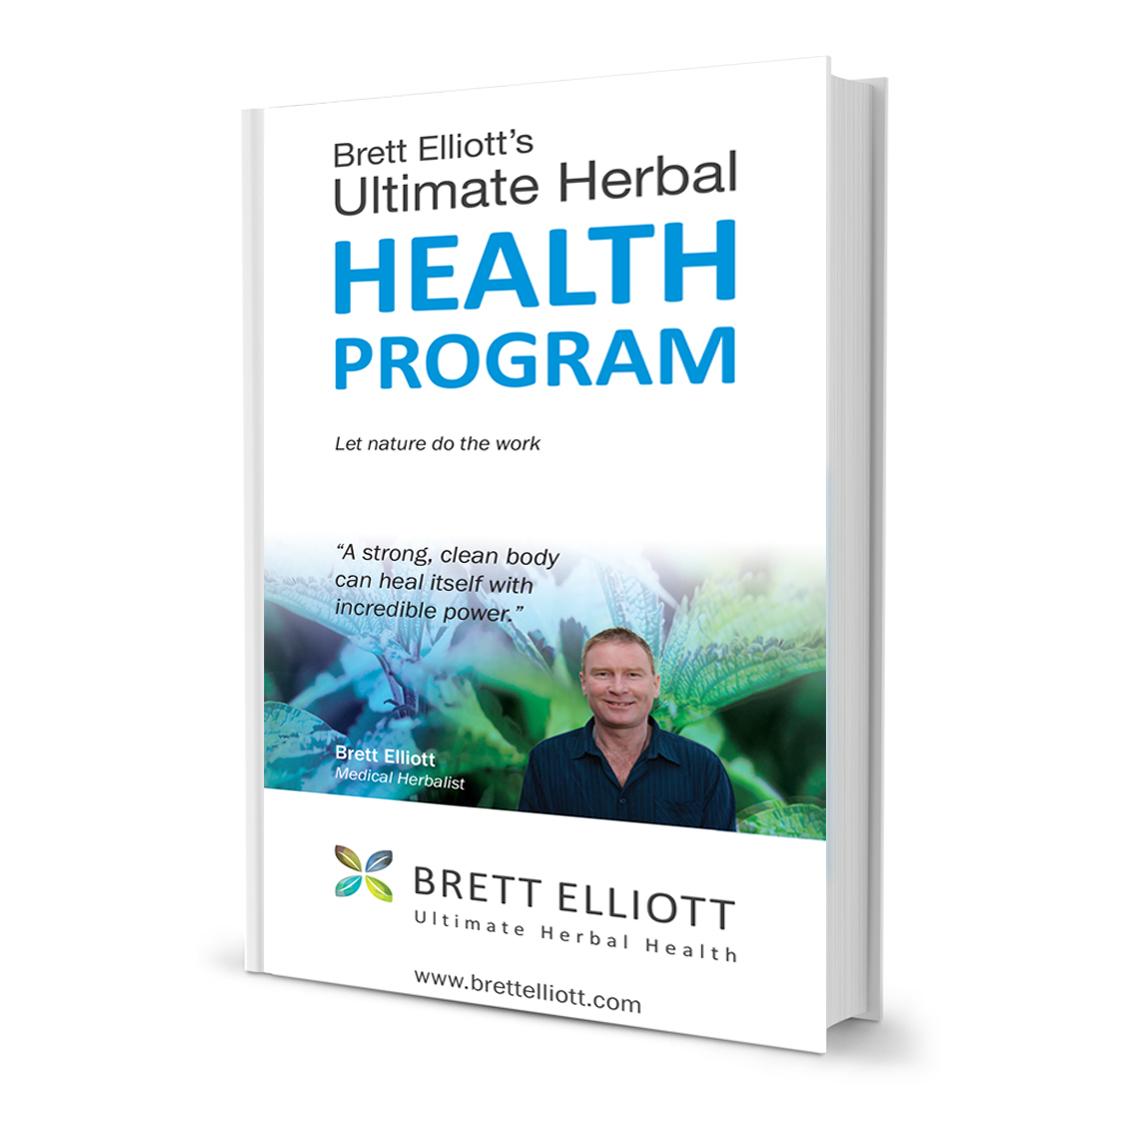 Ultimate Herbal Healing Program